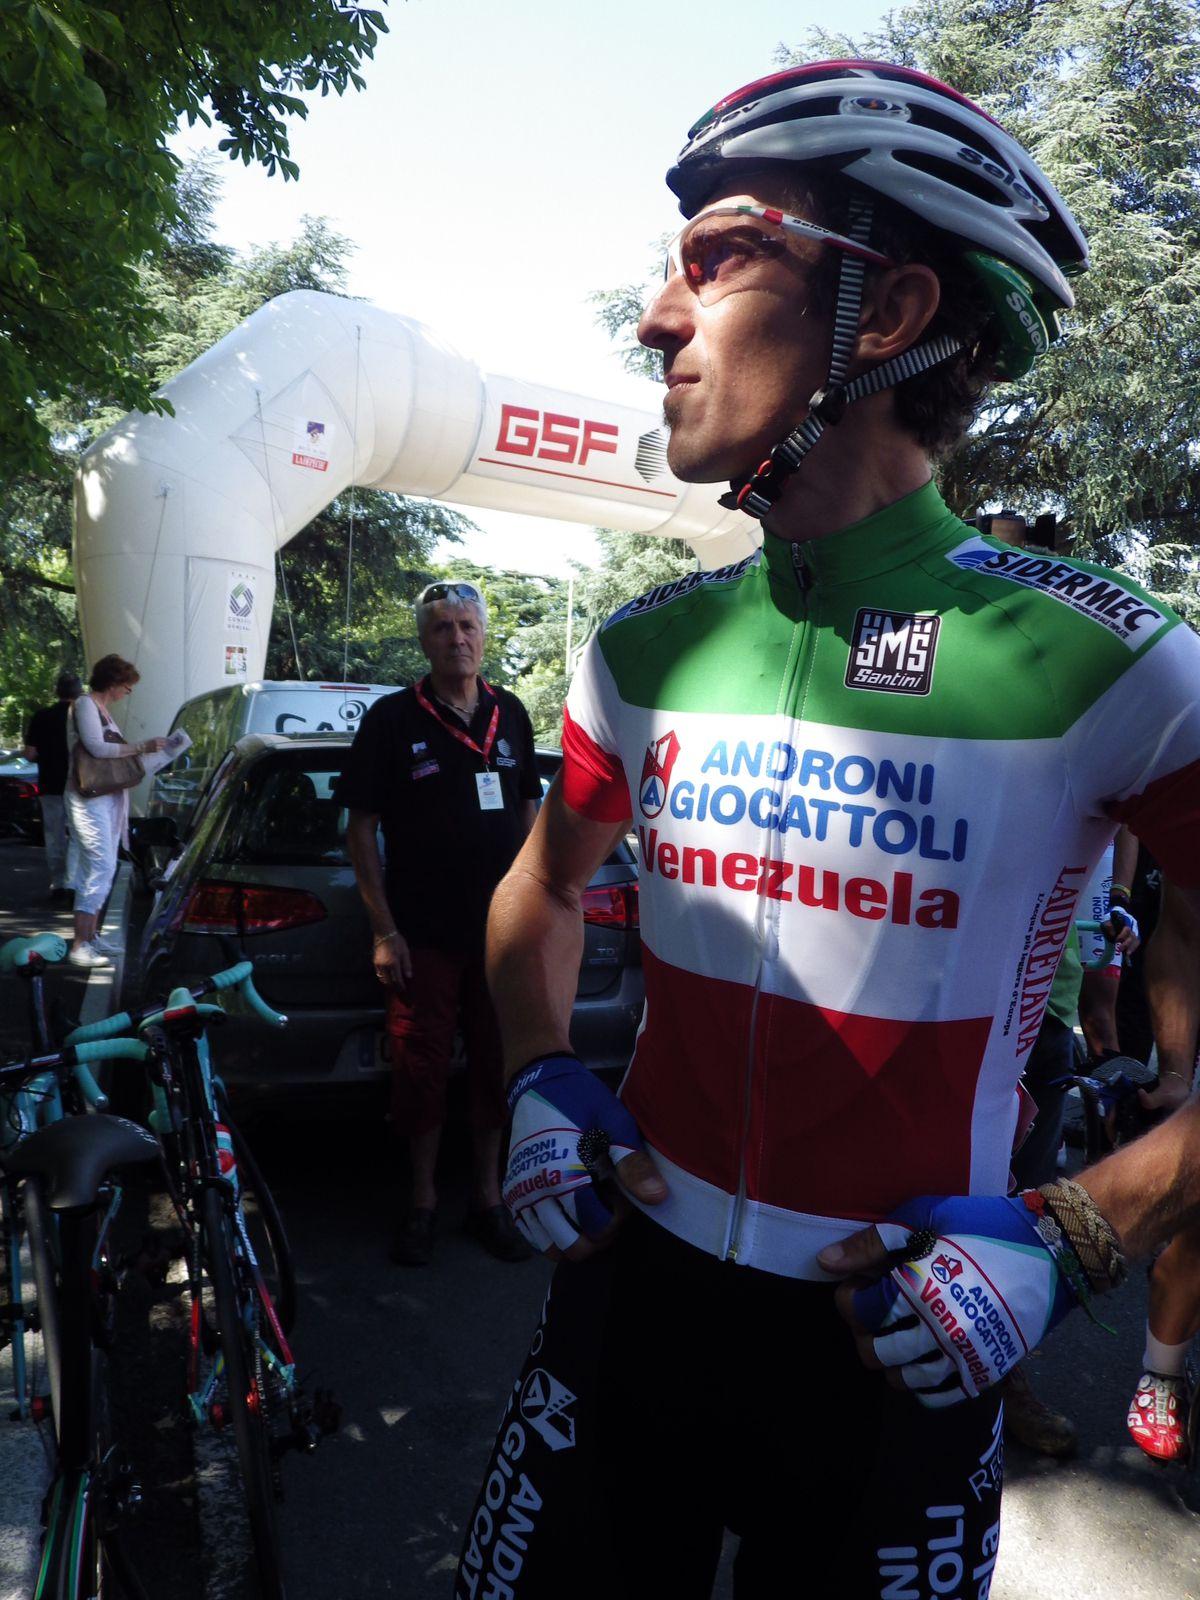 Pellizotti, tentera de garder son maillot vert, blanc, rouge.